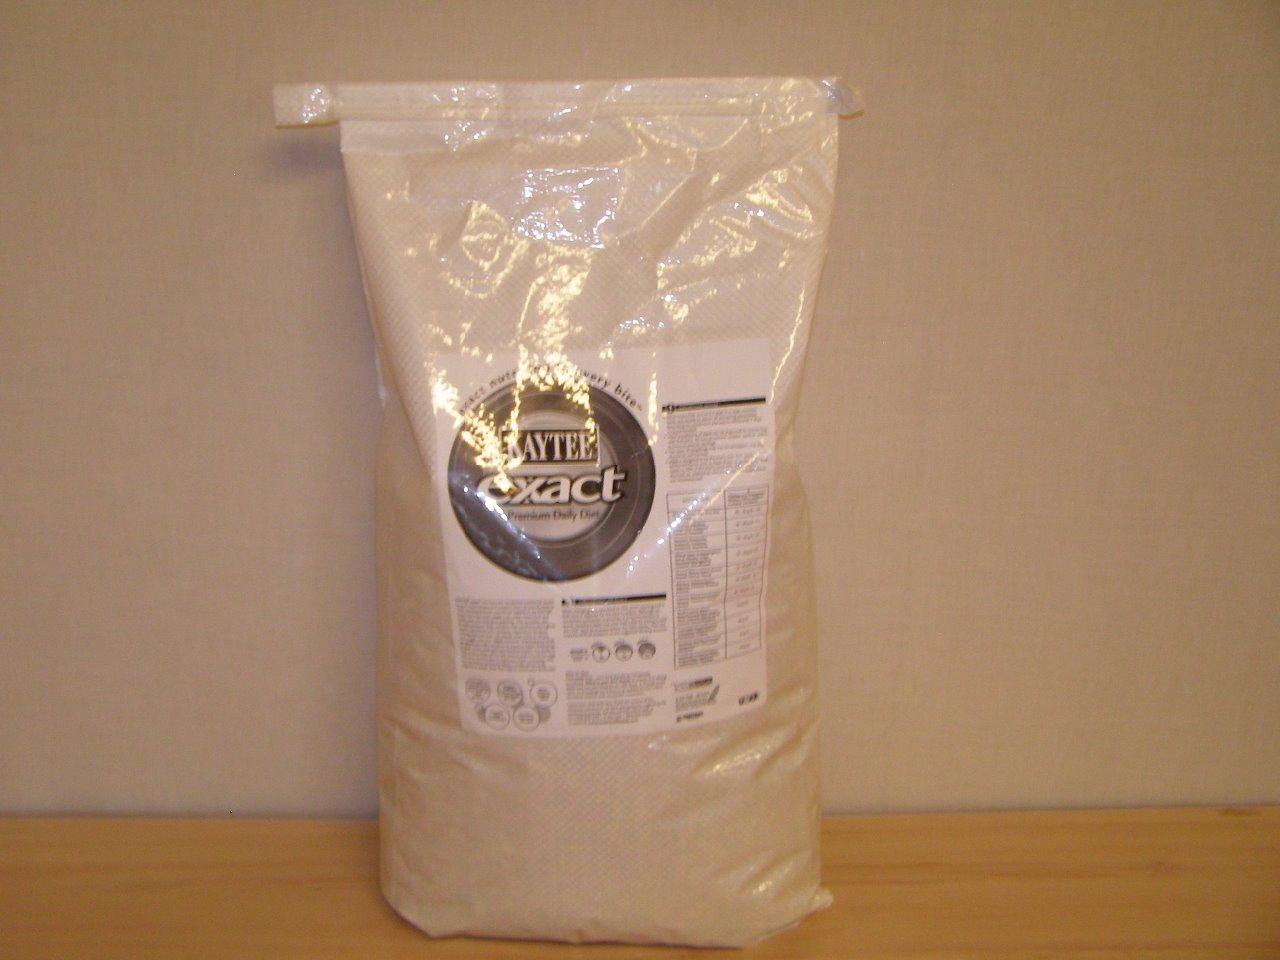 Kaytee Products Granule Exact Rainbow Parrot s DHA 9,07 kg